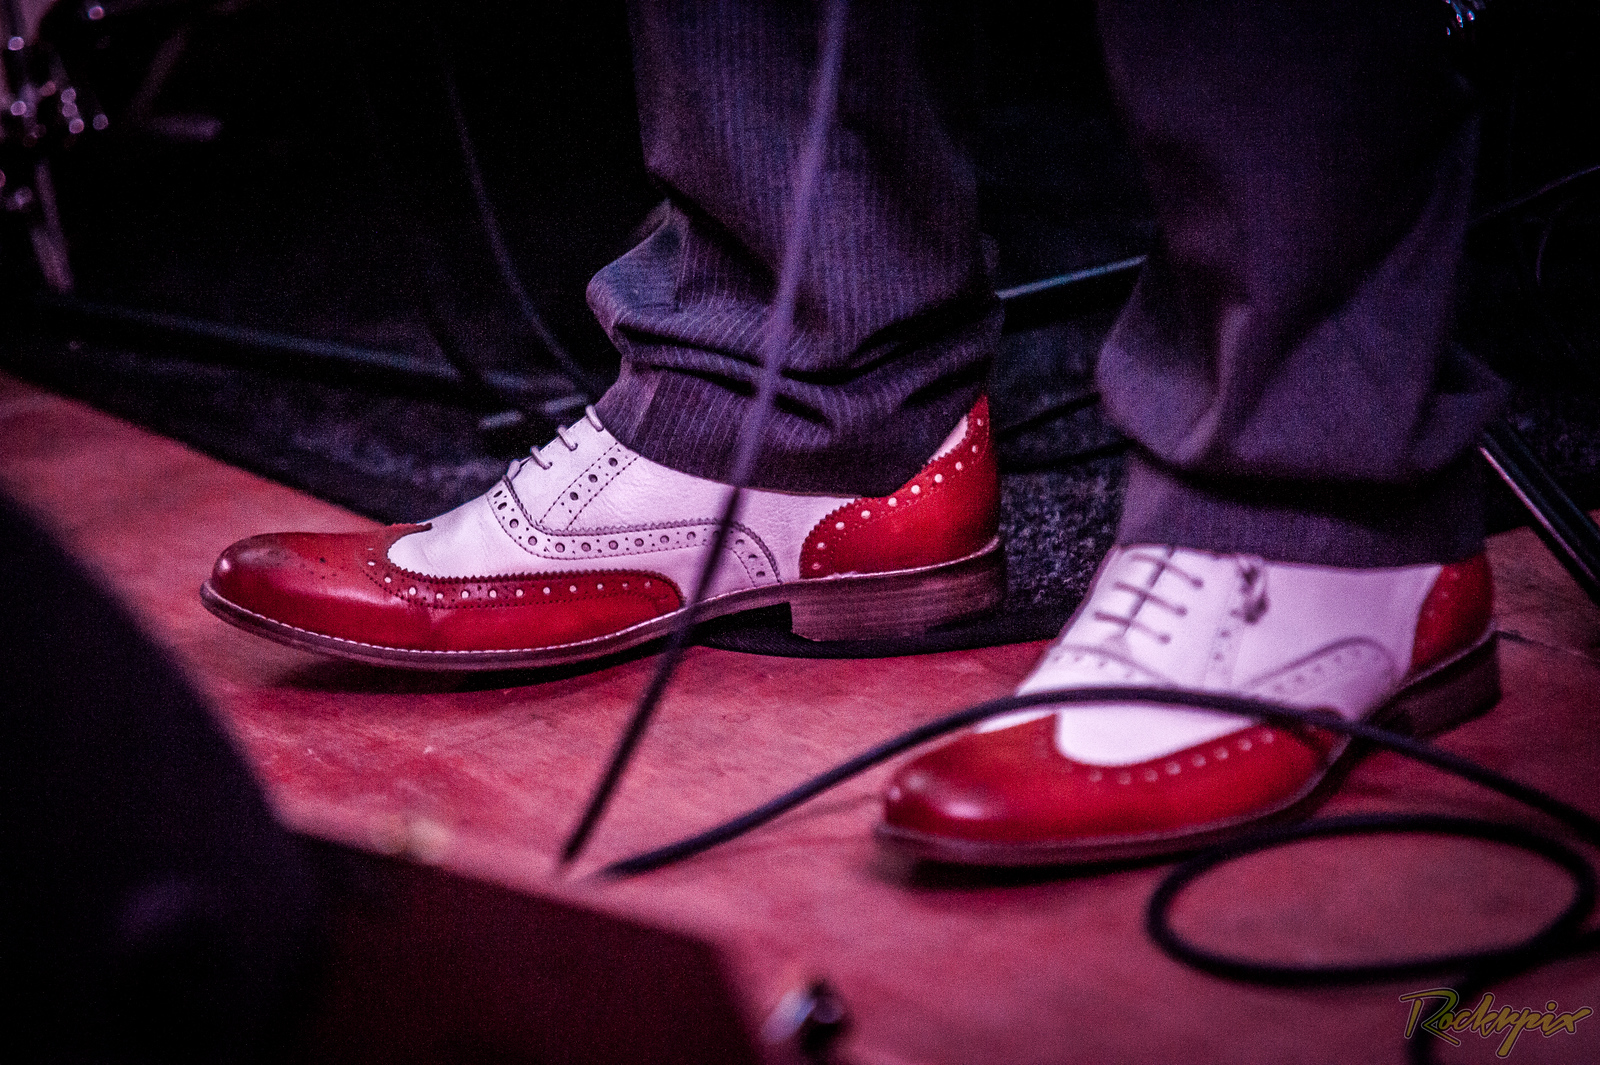 ©Rockrpix - Poplar Jake & The Electric Delta Review